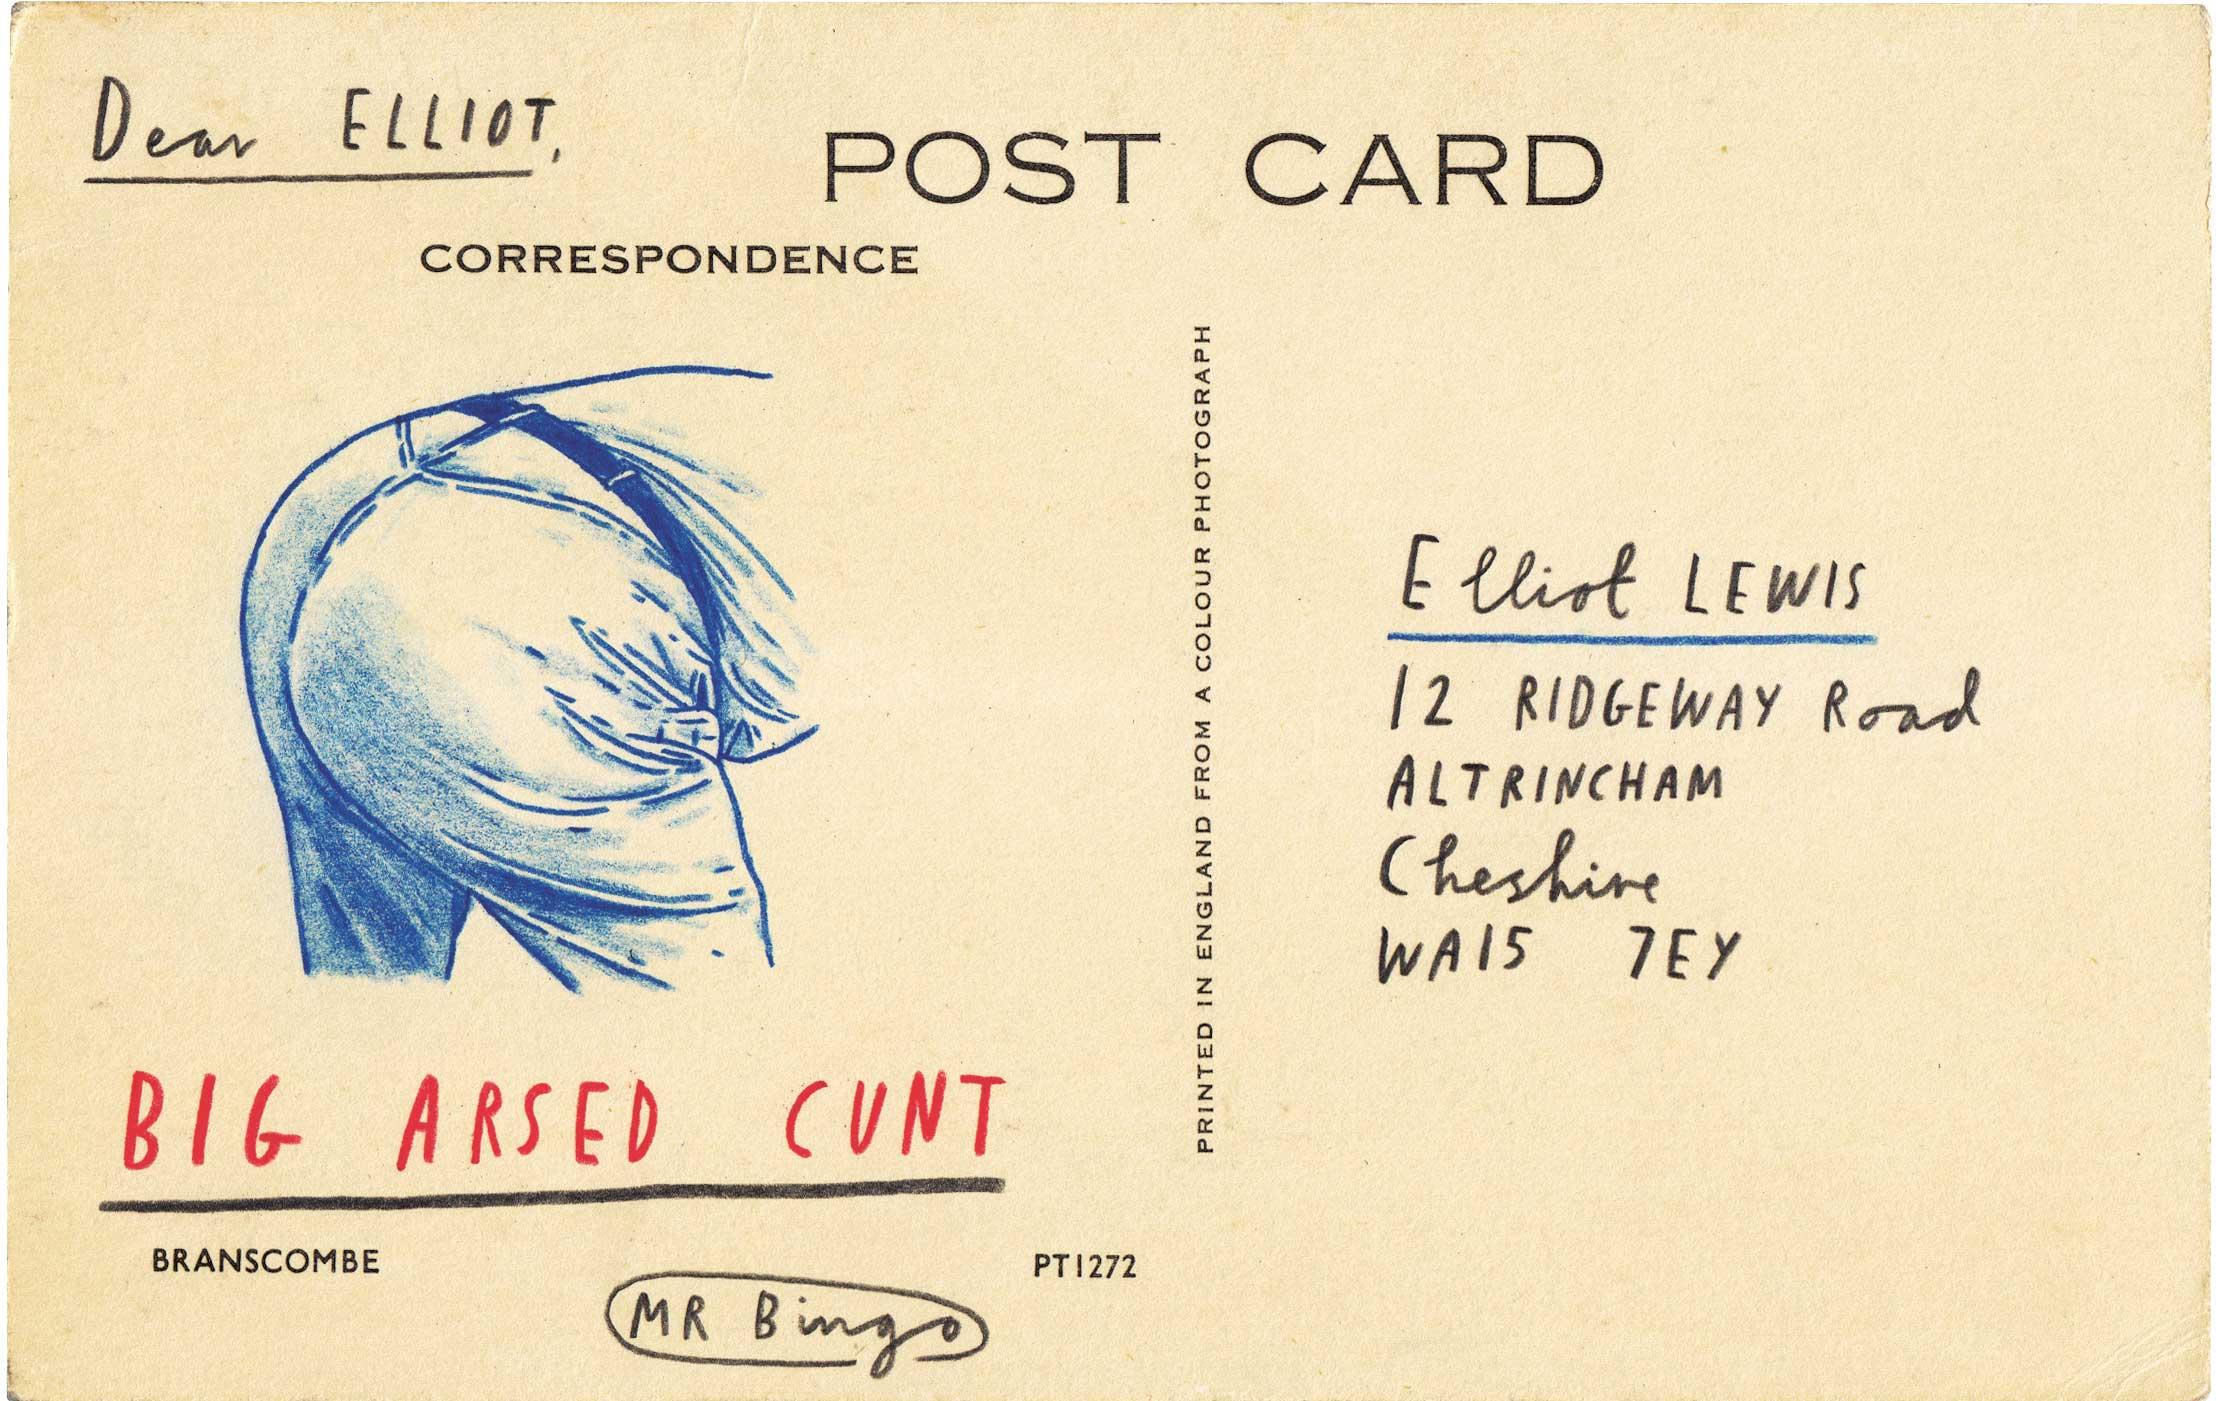 028_Elliot-Lewis_Back-copy